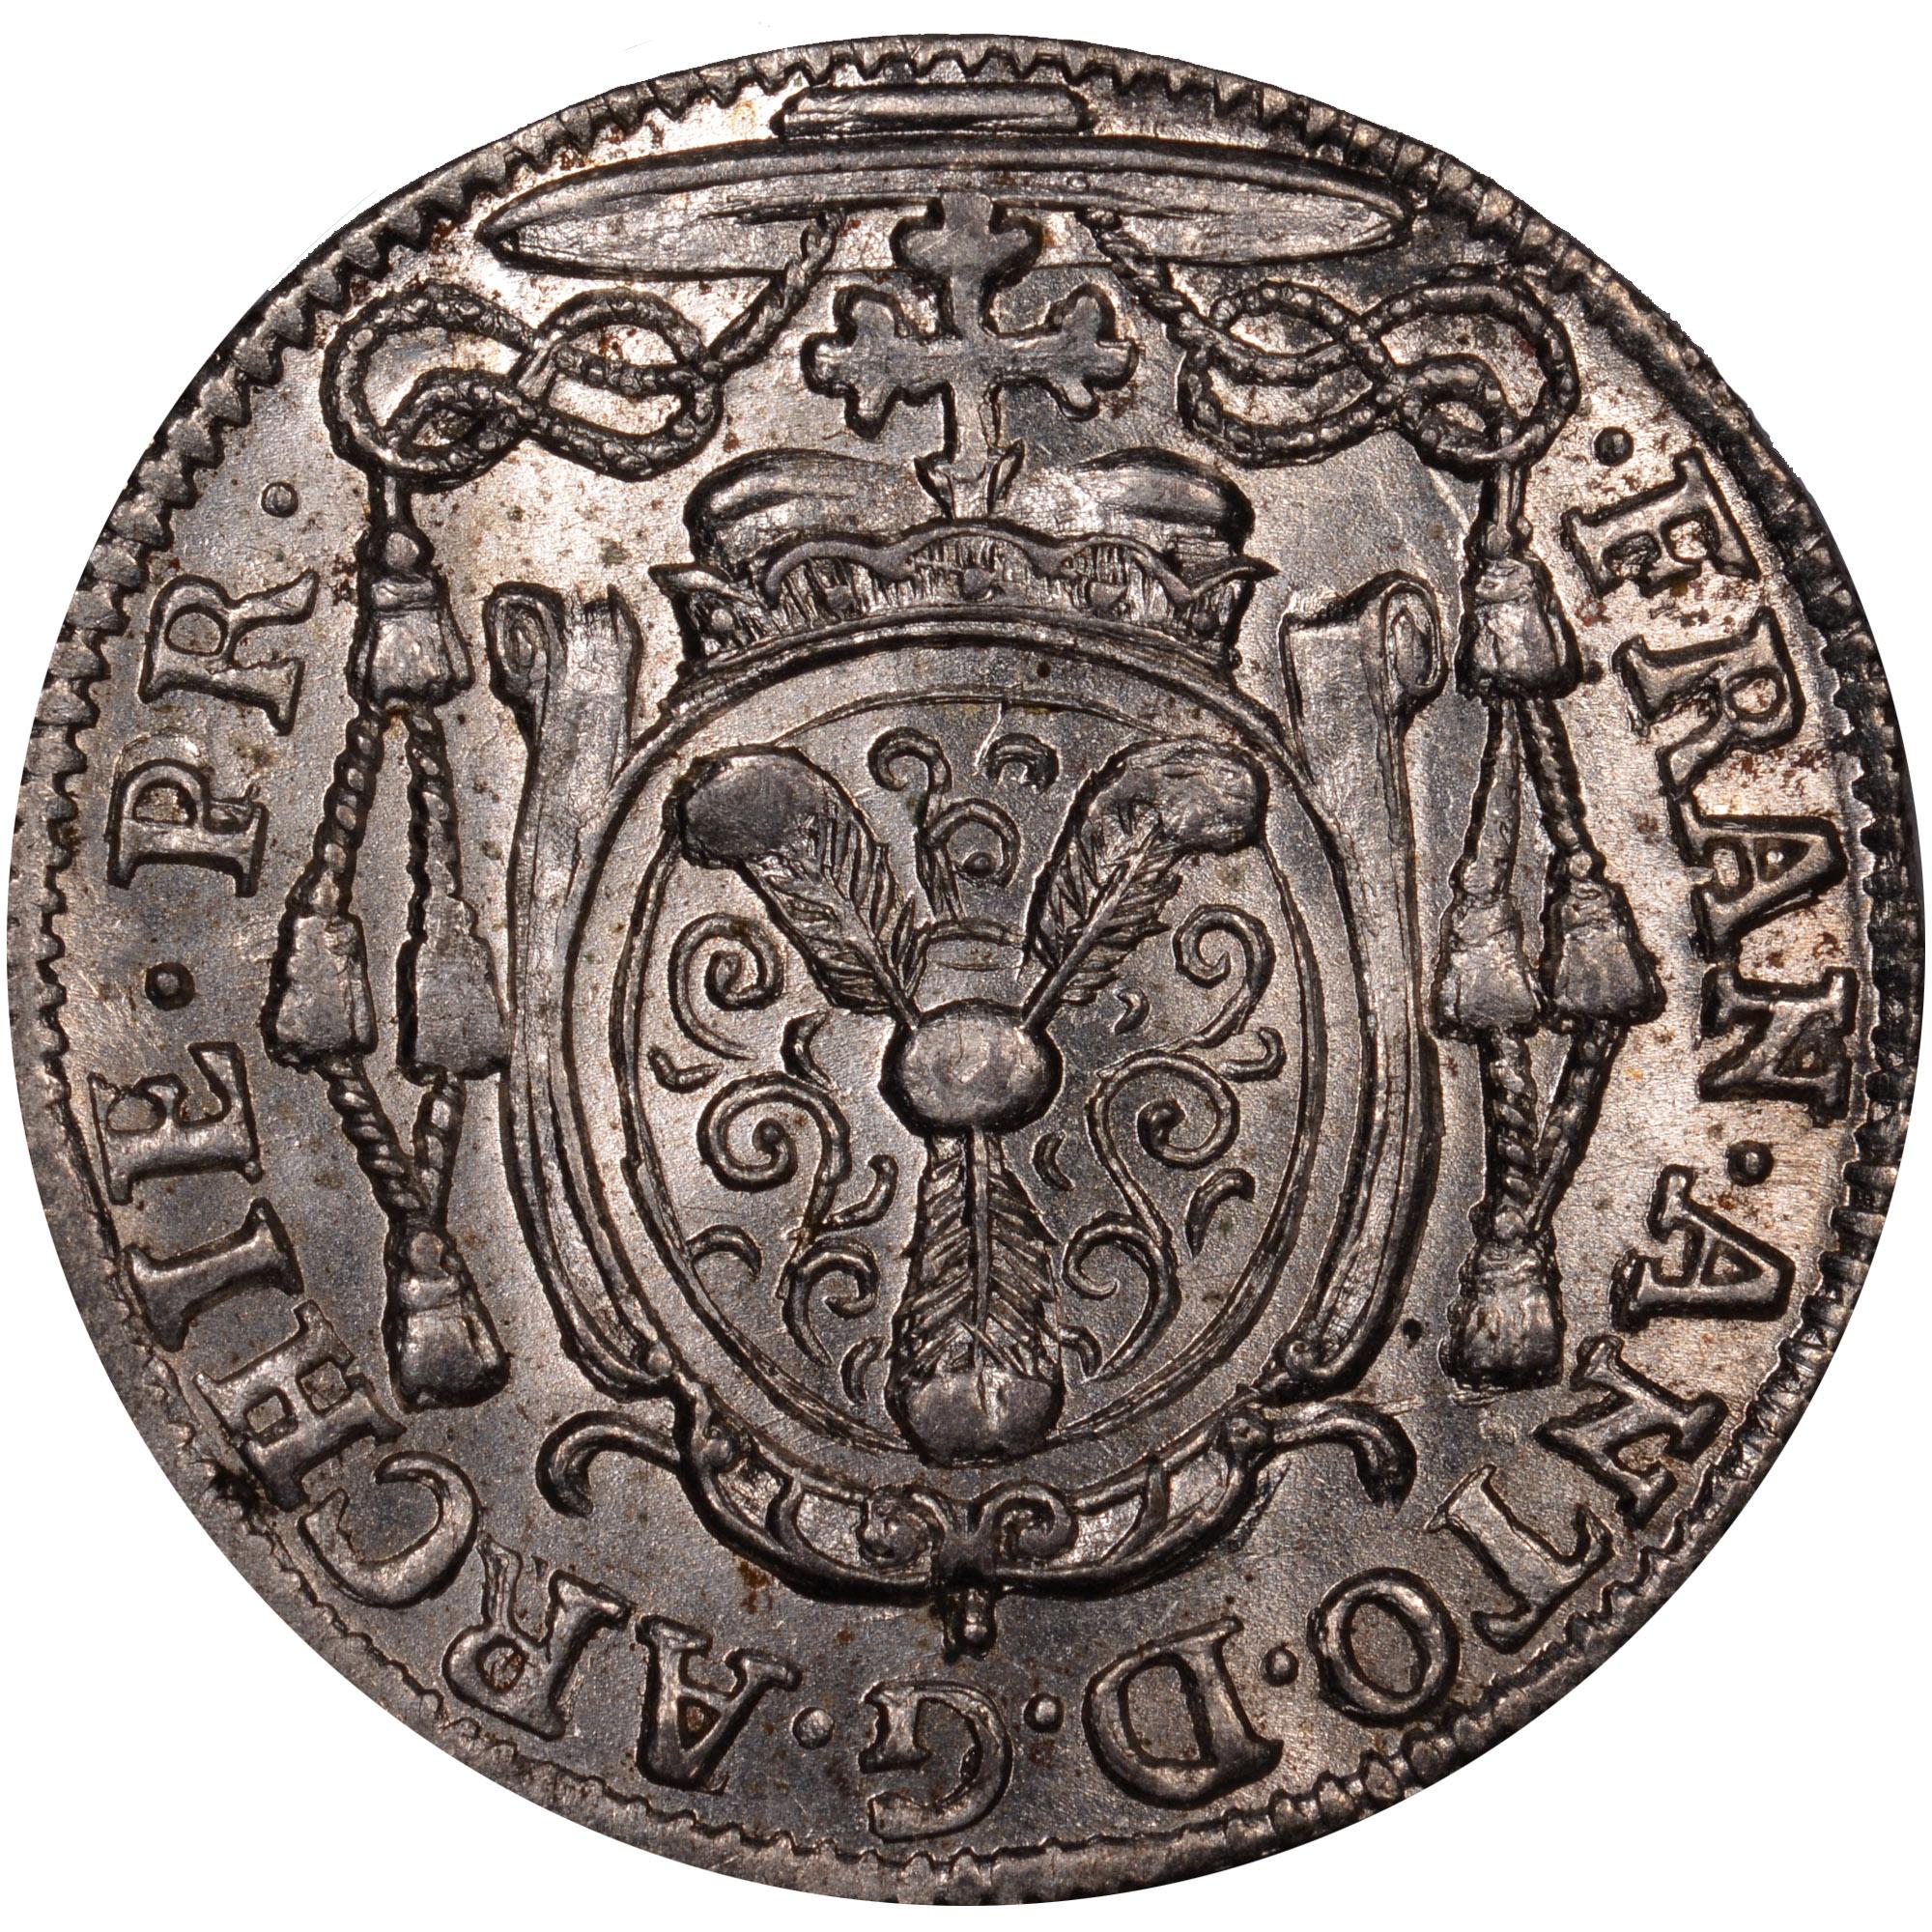 1708-1726 Austrian States SALZBURG 2 Kreuzer, 1/2 Batzen obverse